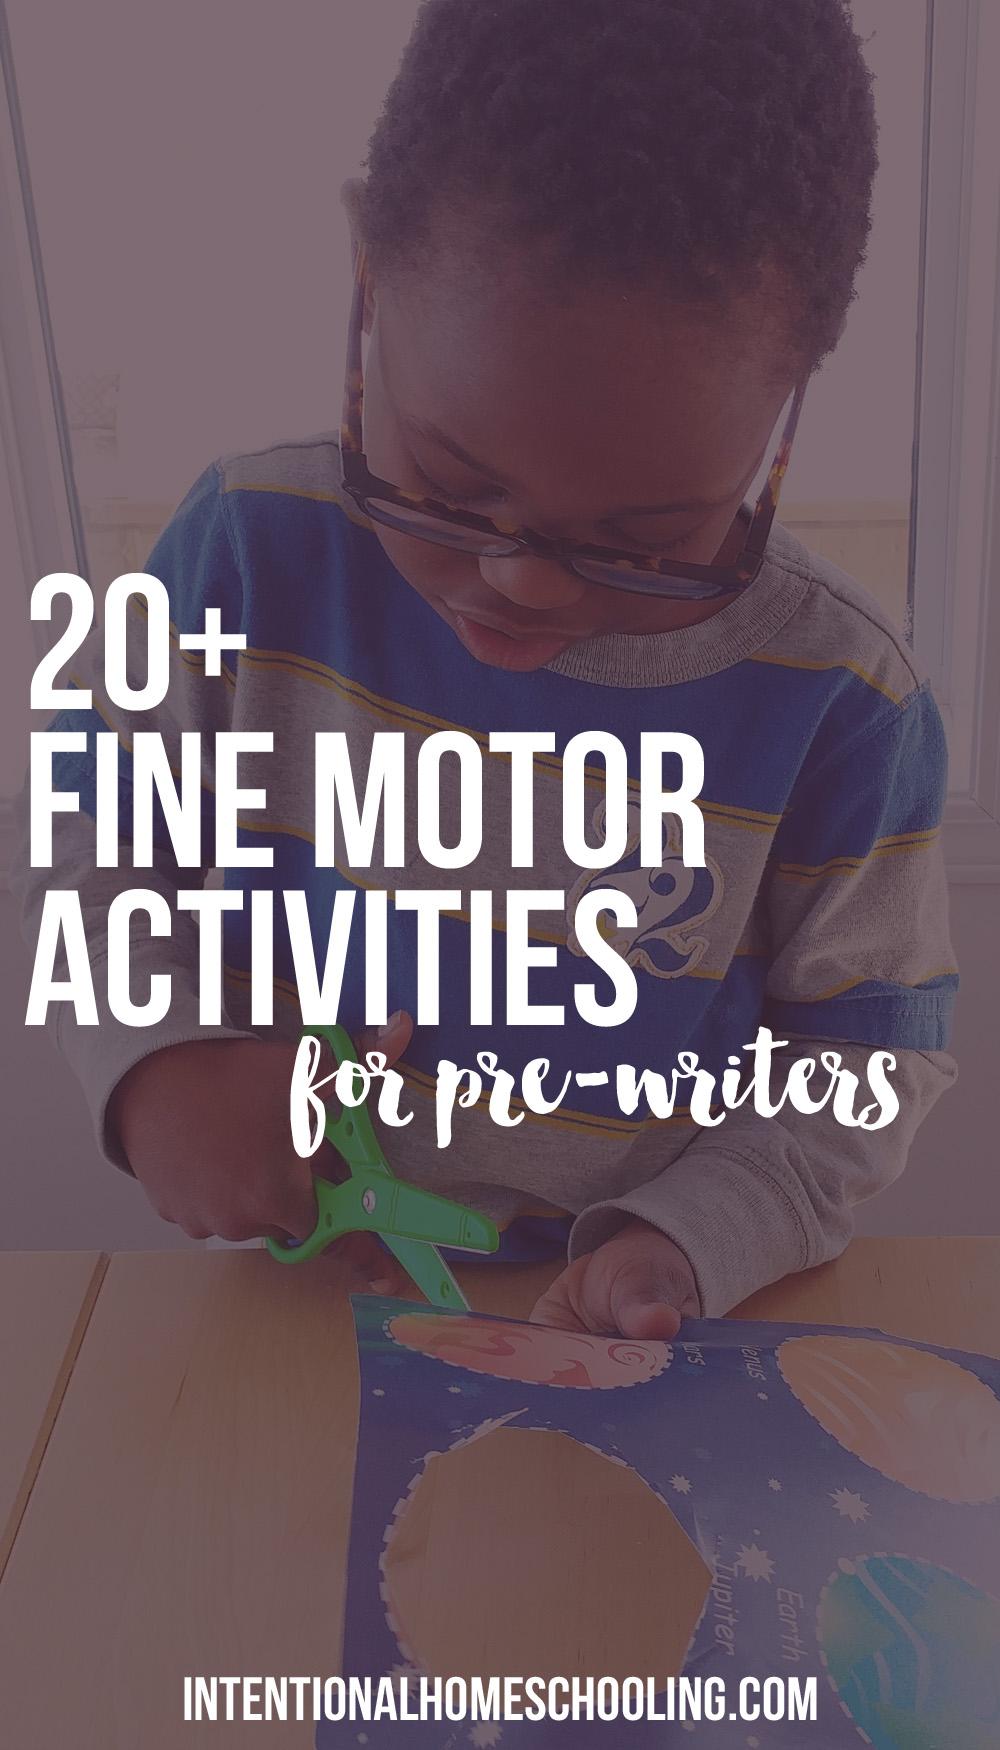 More than 20 activities to help develop fine motor skills in preschool pre-writers.